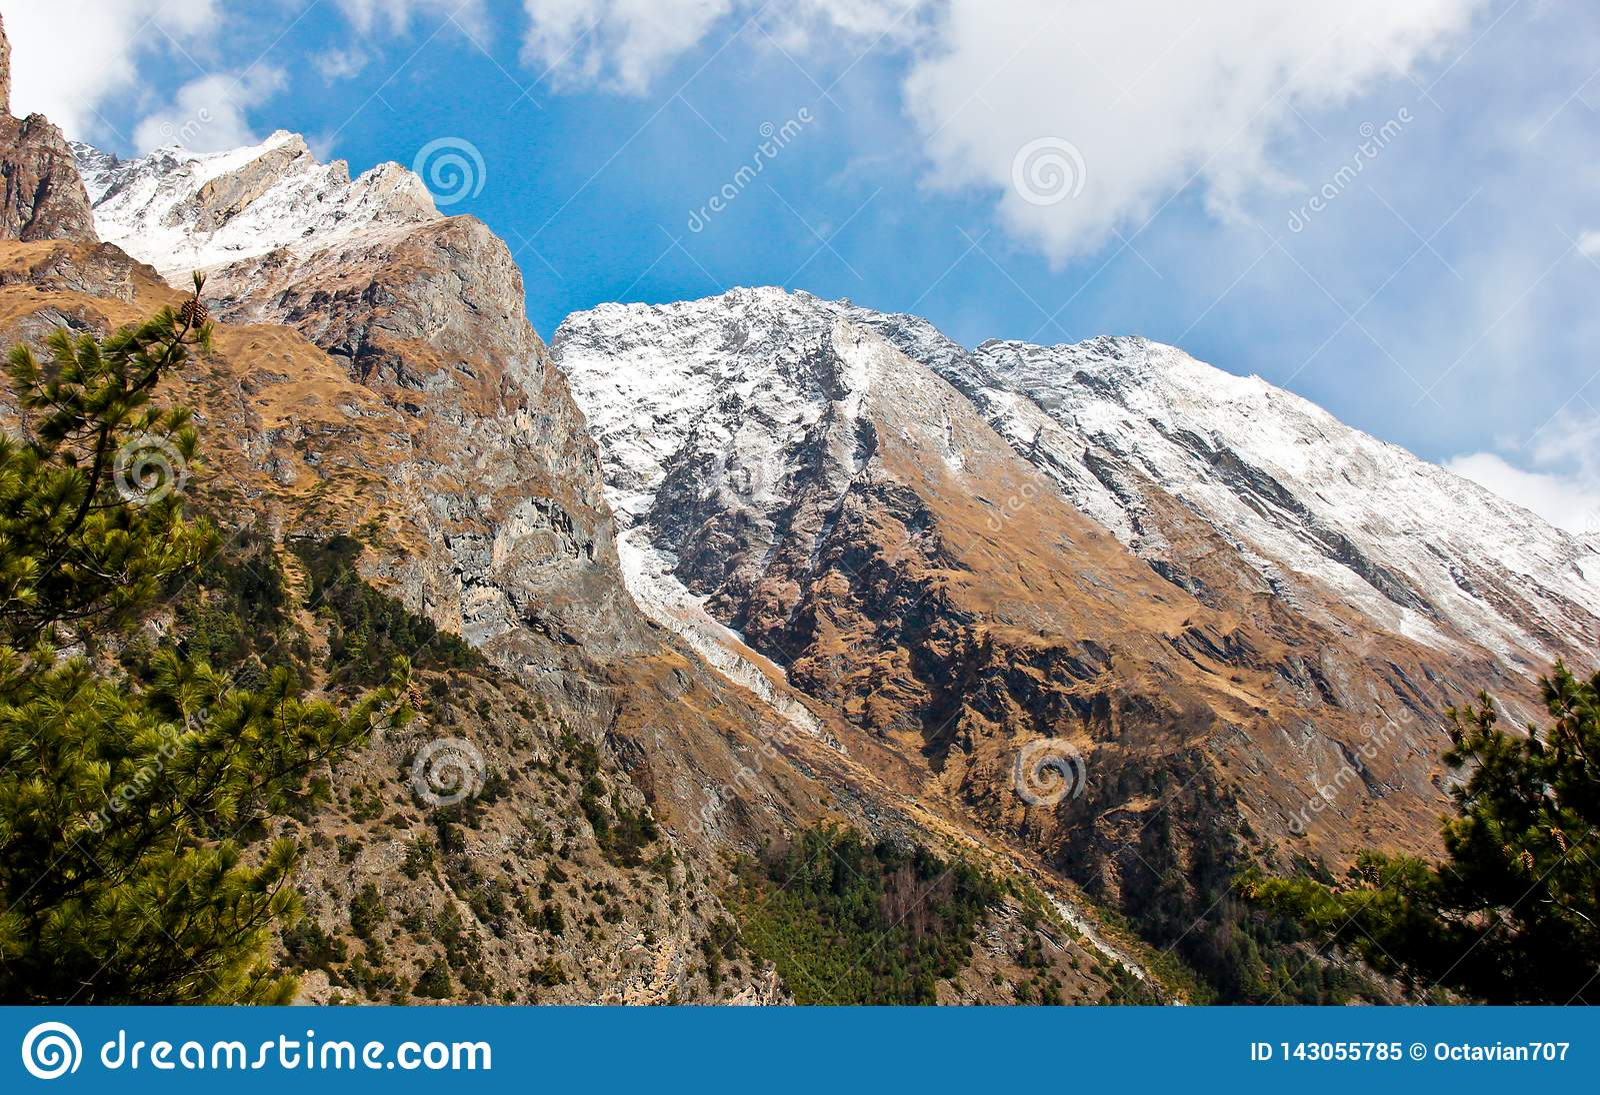 Landscape in Nepal / Himalaya